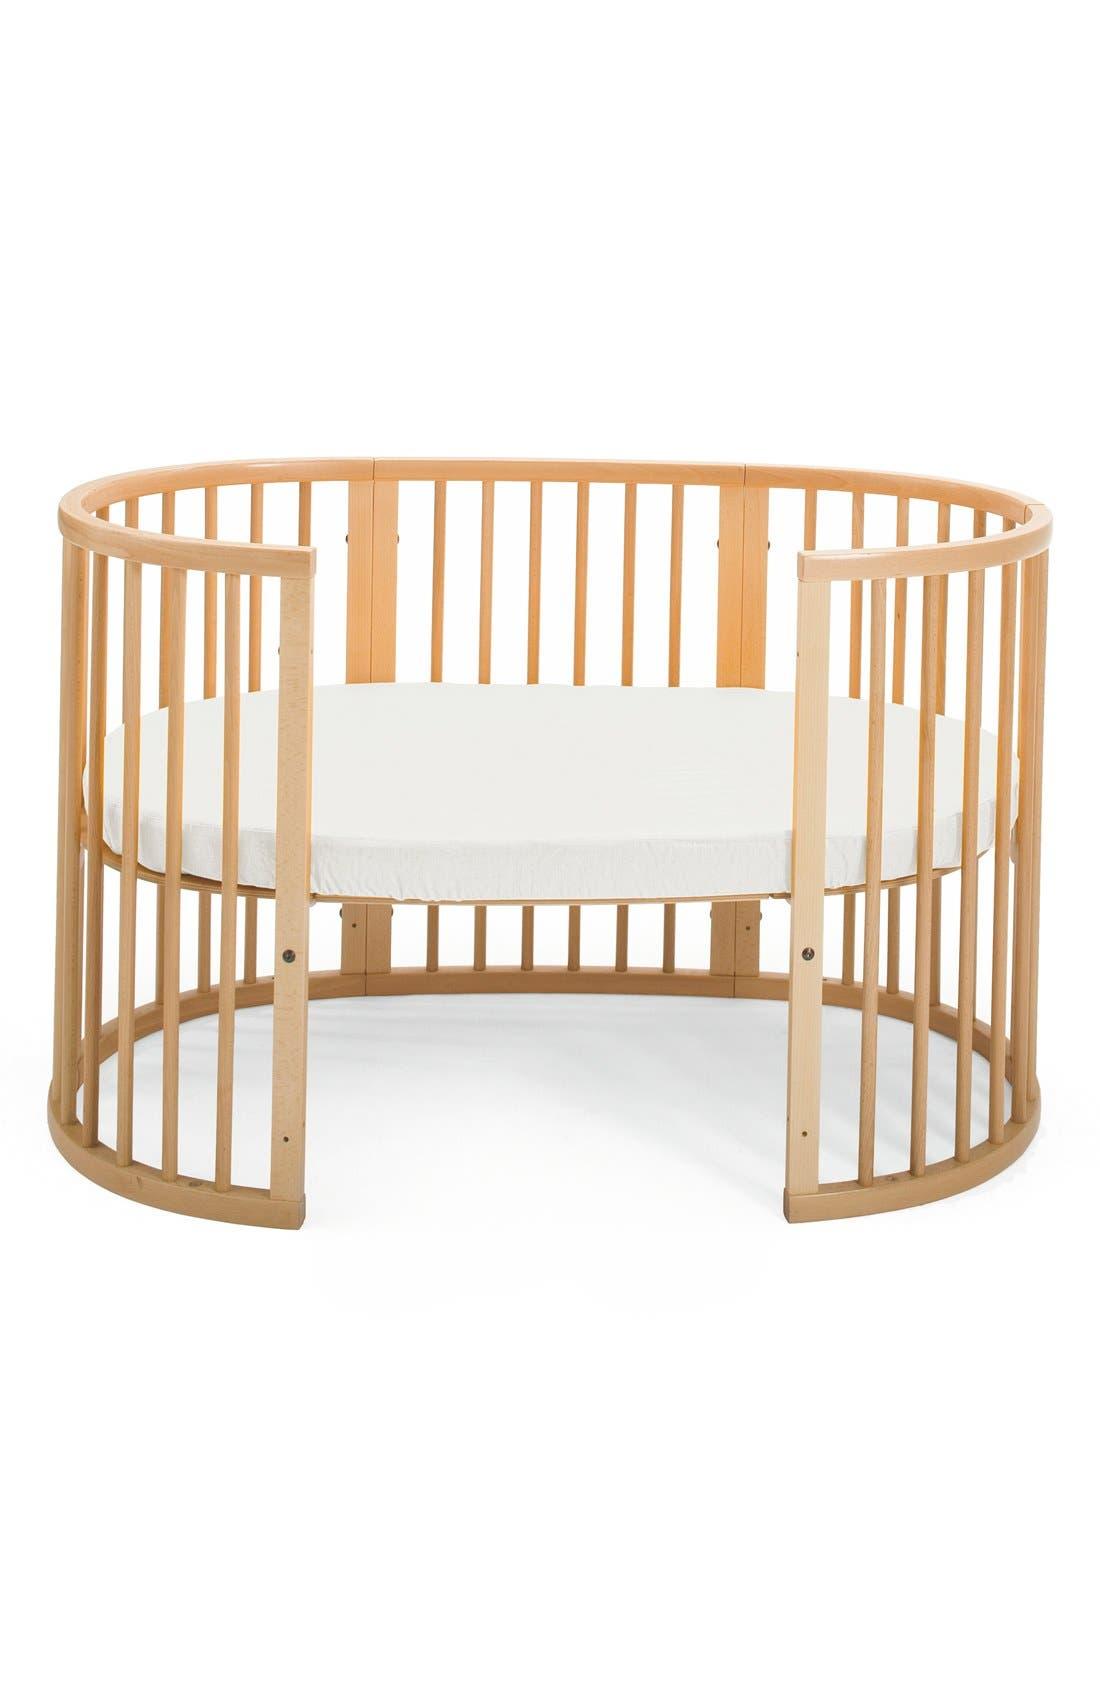 Alternate Image 3  - Stokke Convertible Sleepi Crib & Toddler Bed